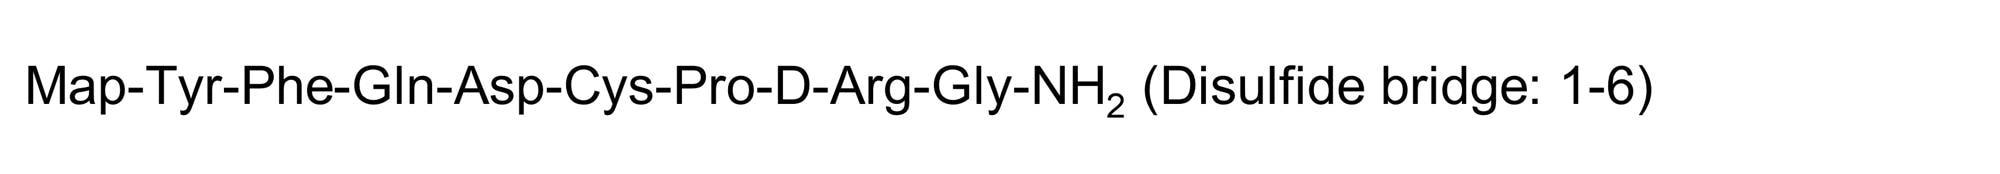 Chemical Structure - Desmopressin, Vasopressin analog (ab142281)